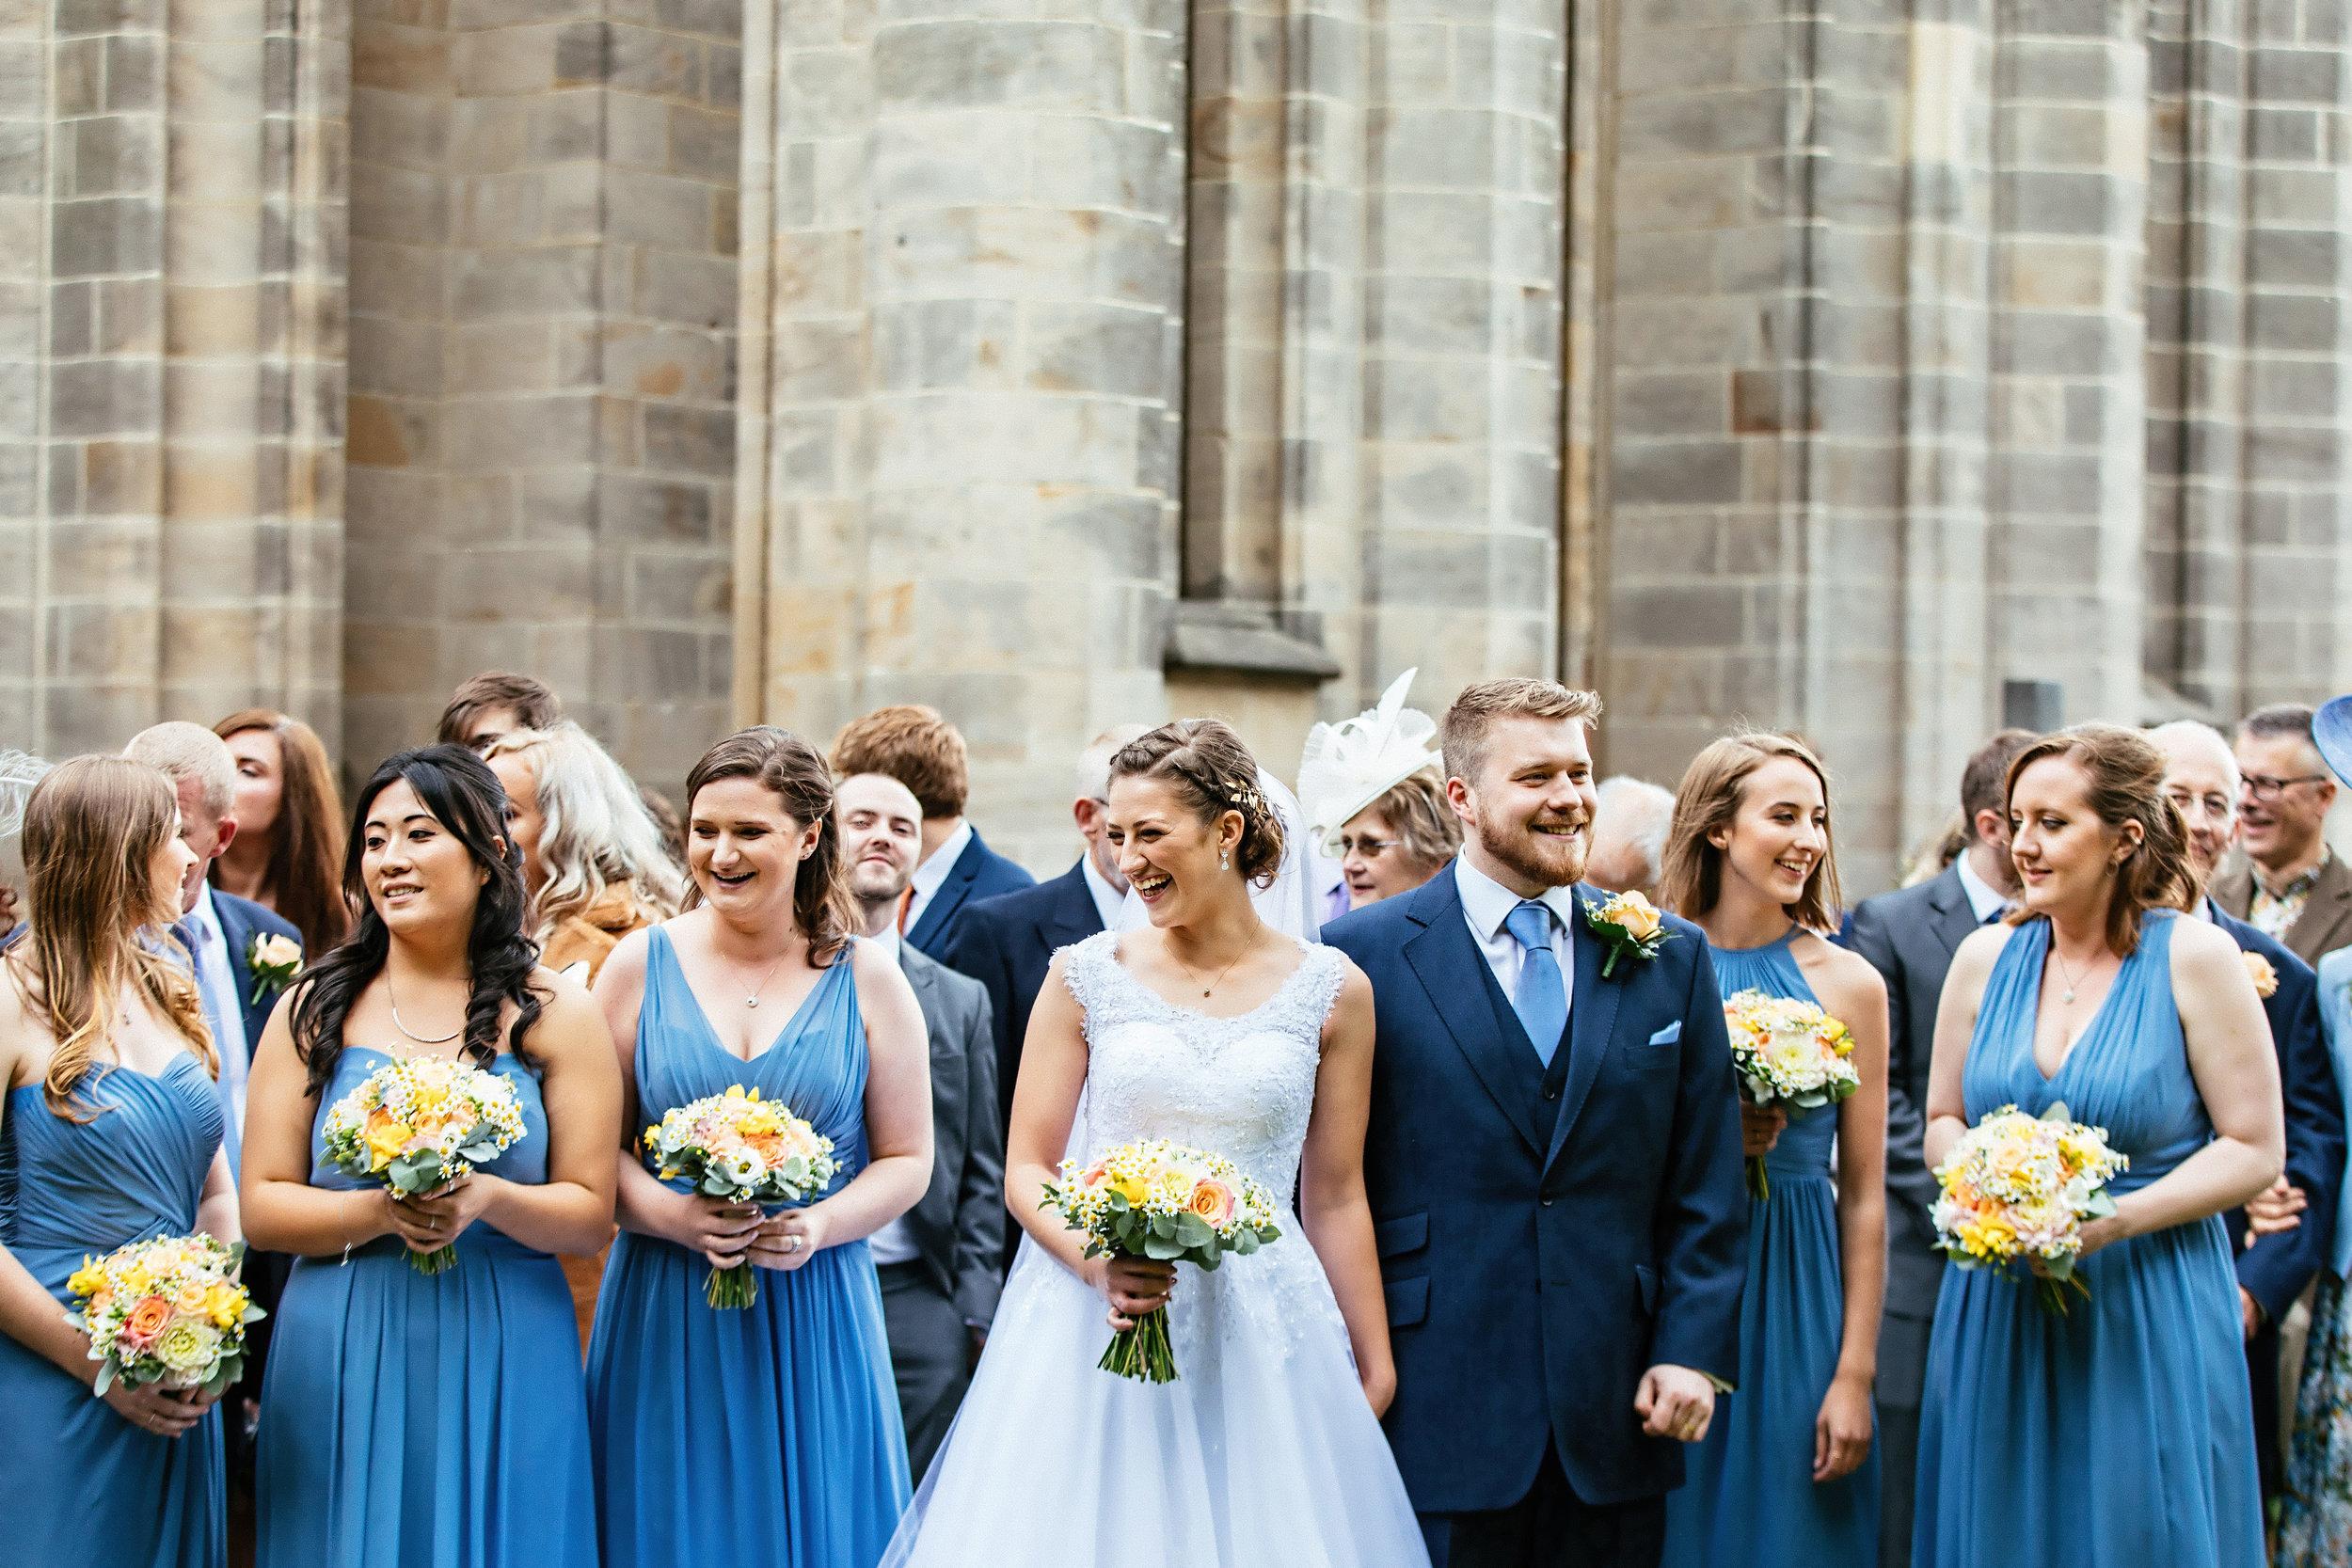 Kathryn-and-Mike-Wedding-Highlights-36.jpg